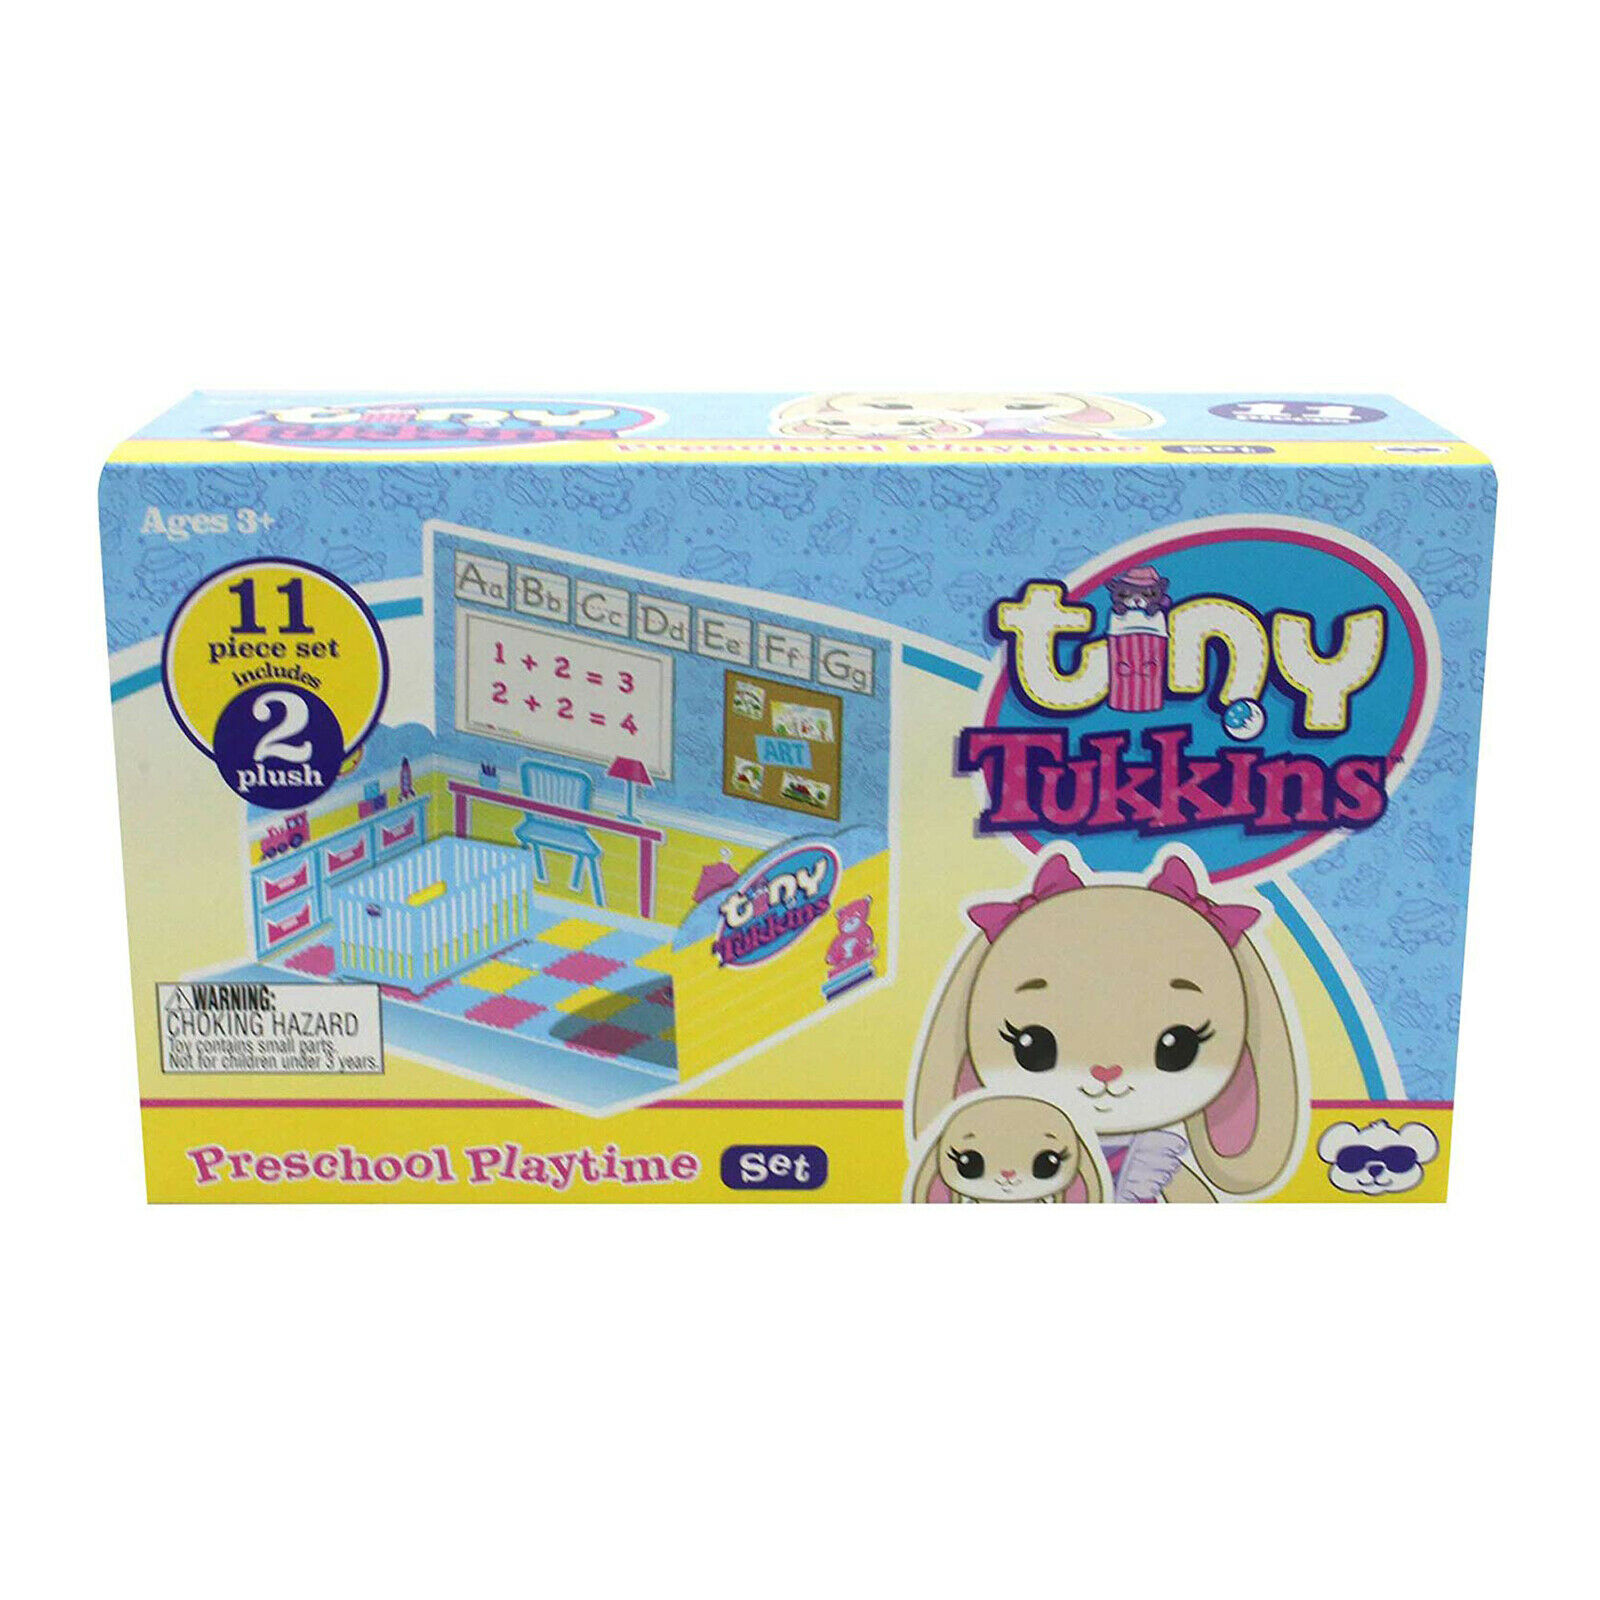 Tiny Tukkins - 11 pcs. Playset - Preschool Playtime, Beige